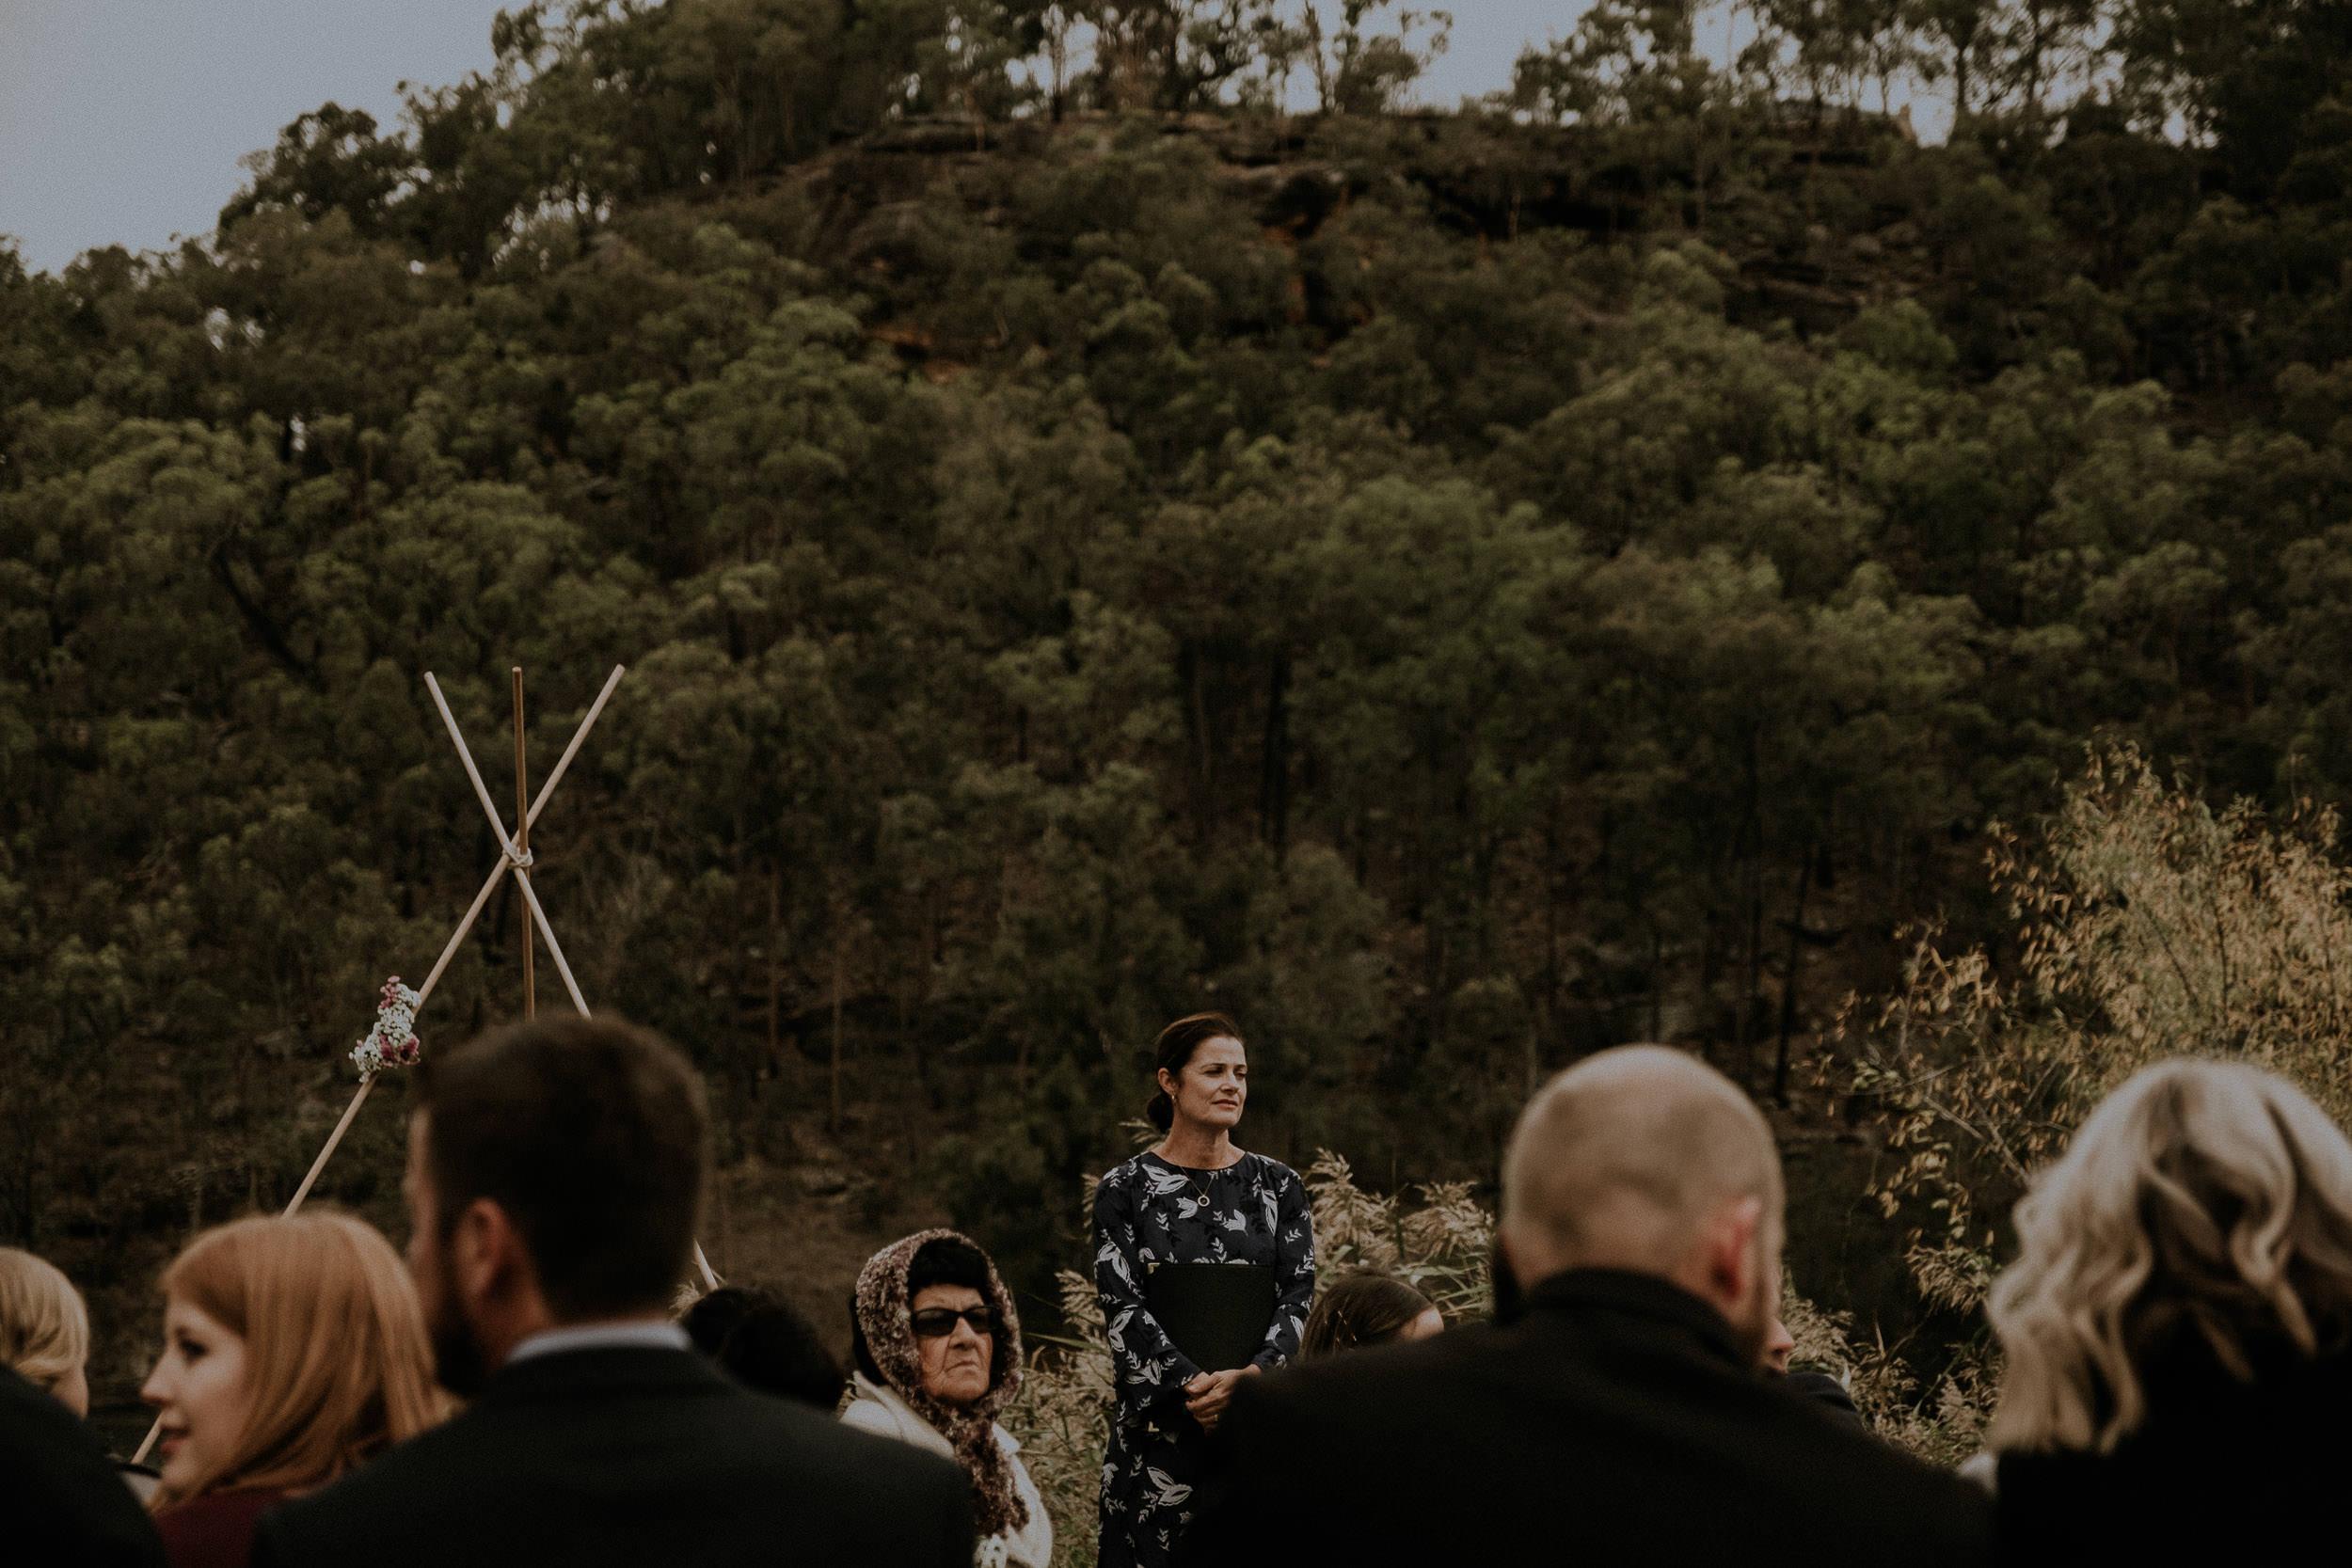 g_c wedding - kings _ thieves elopement wedding photography - blog 8.jpg